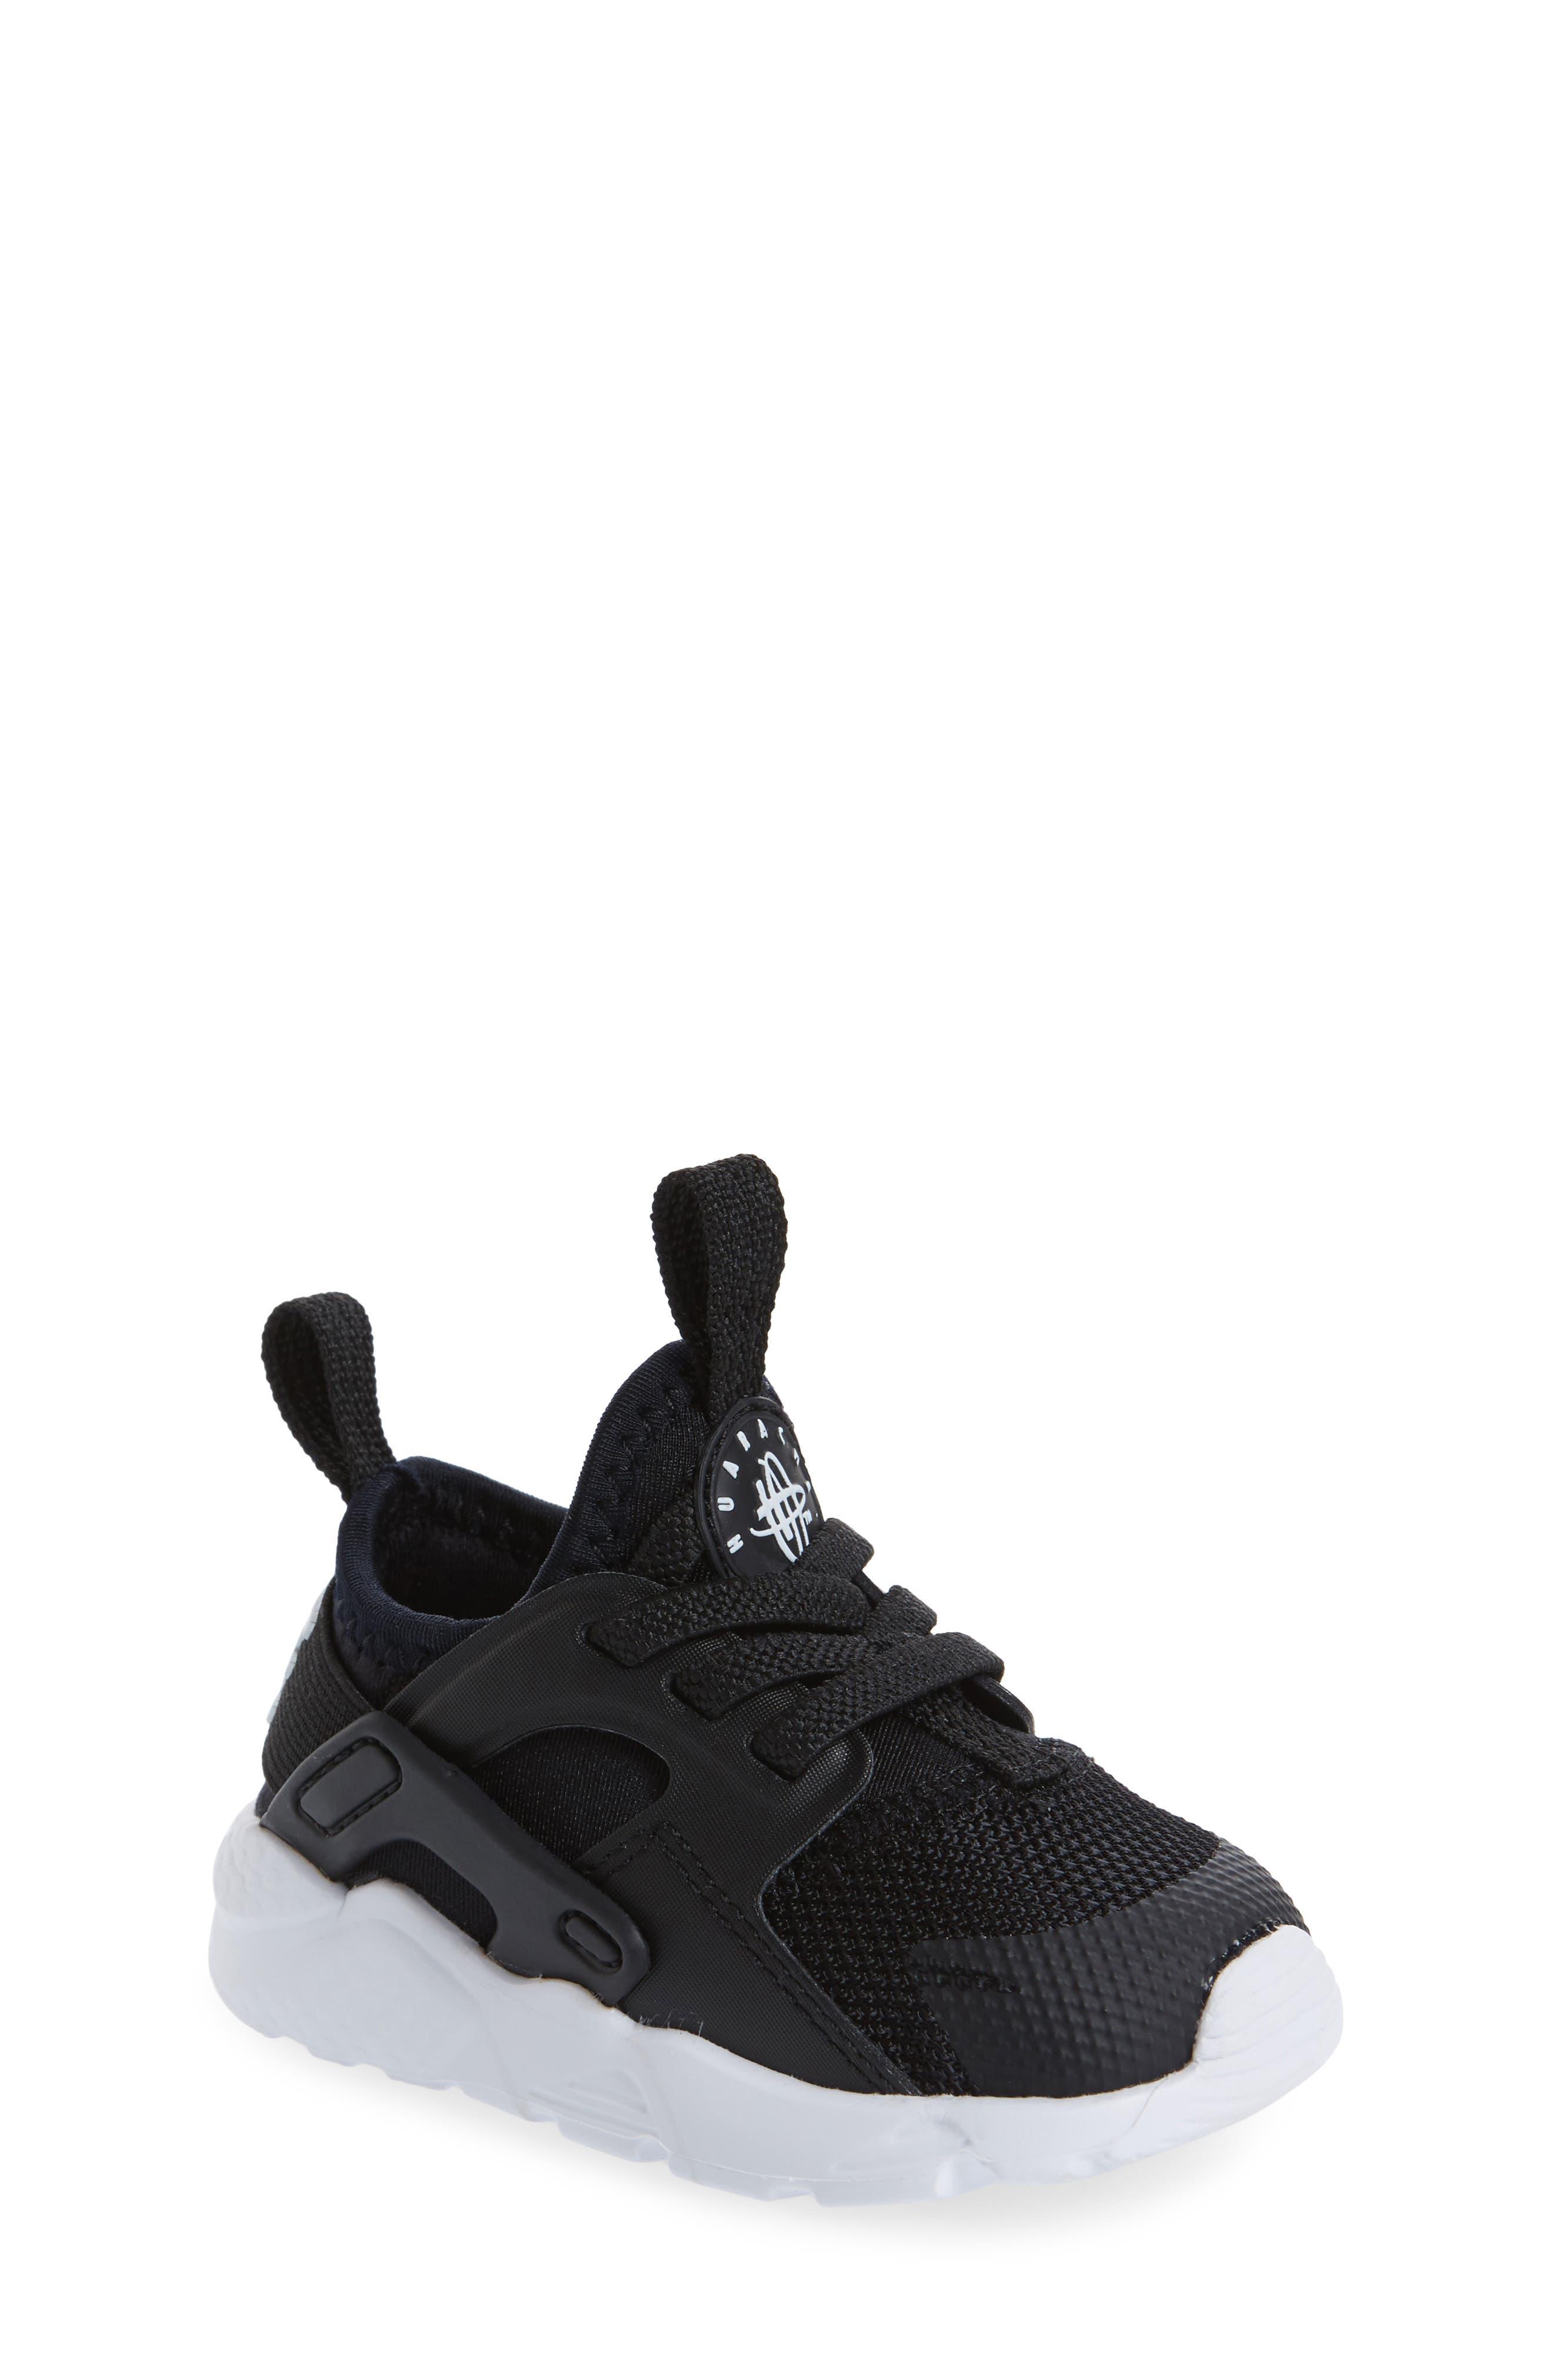 Air Huarache Run Ultra Sneaker,                             Main thumbnail 1, color,                             Black/ Black/ White